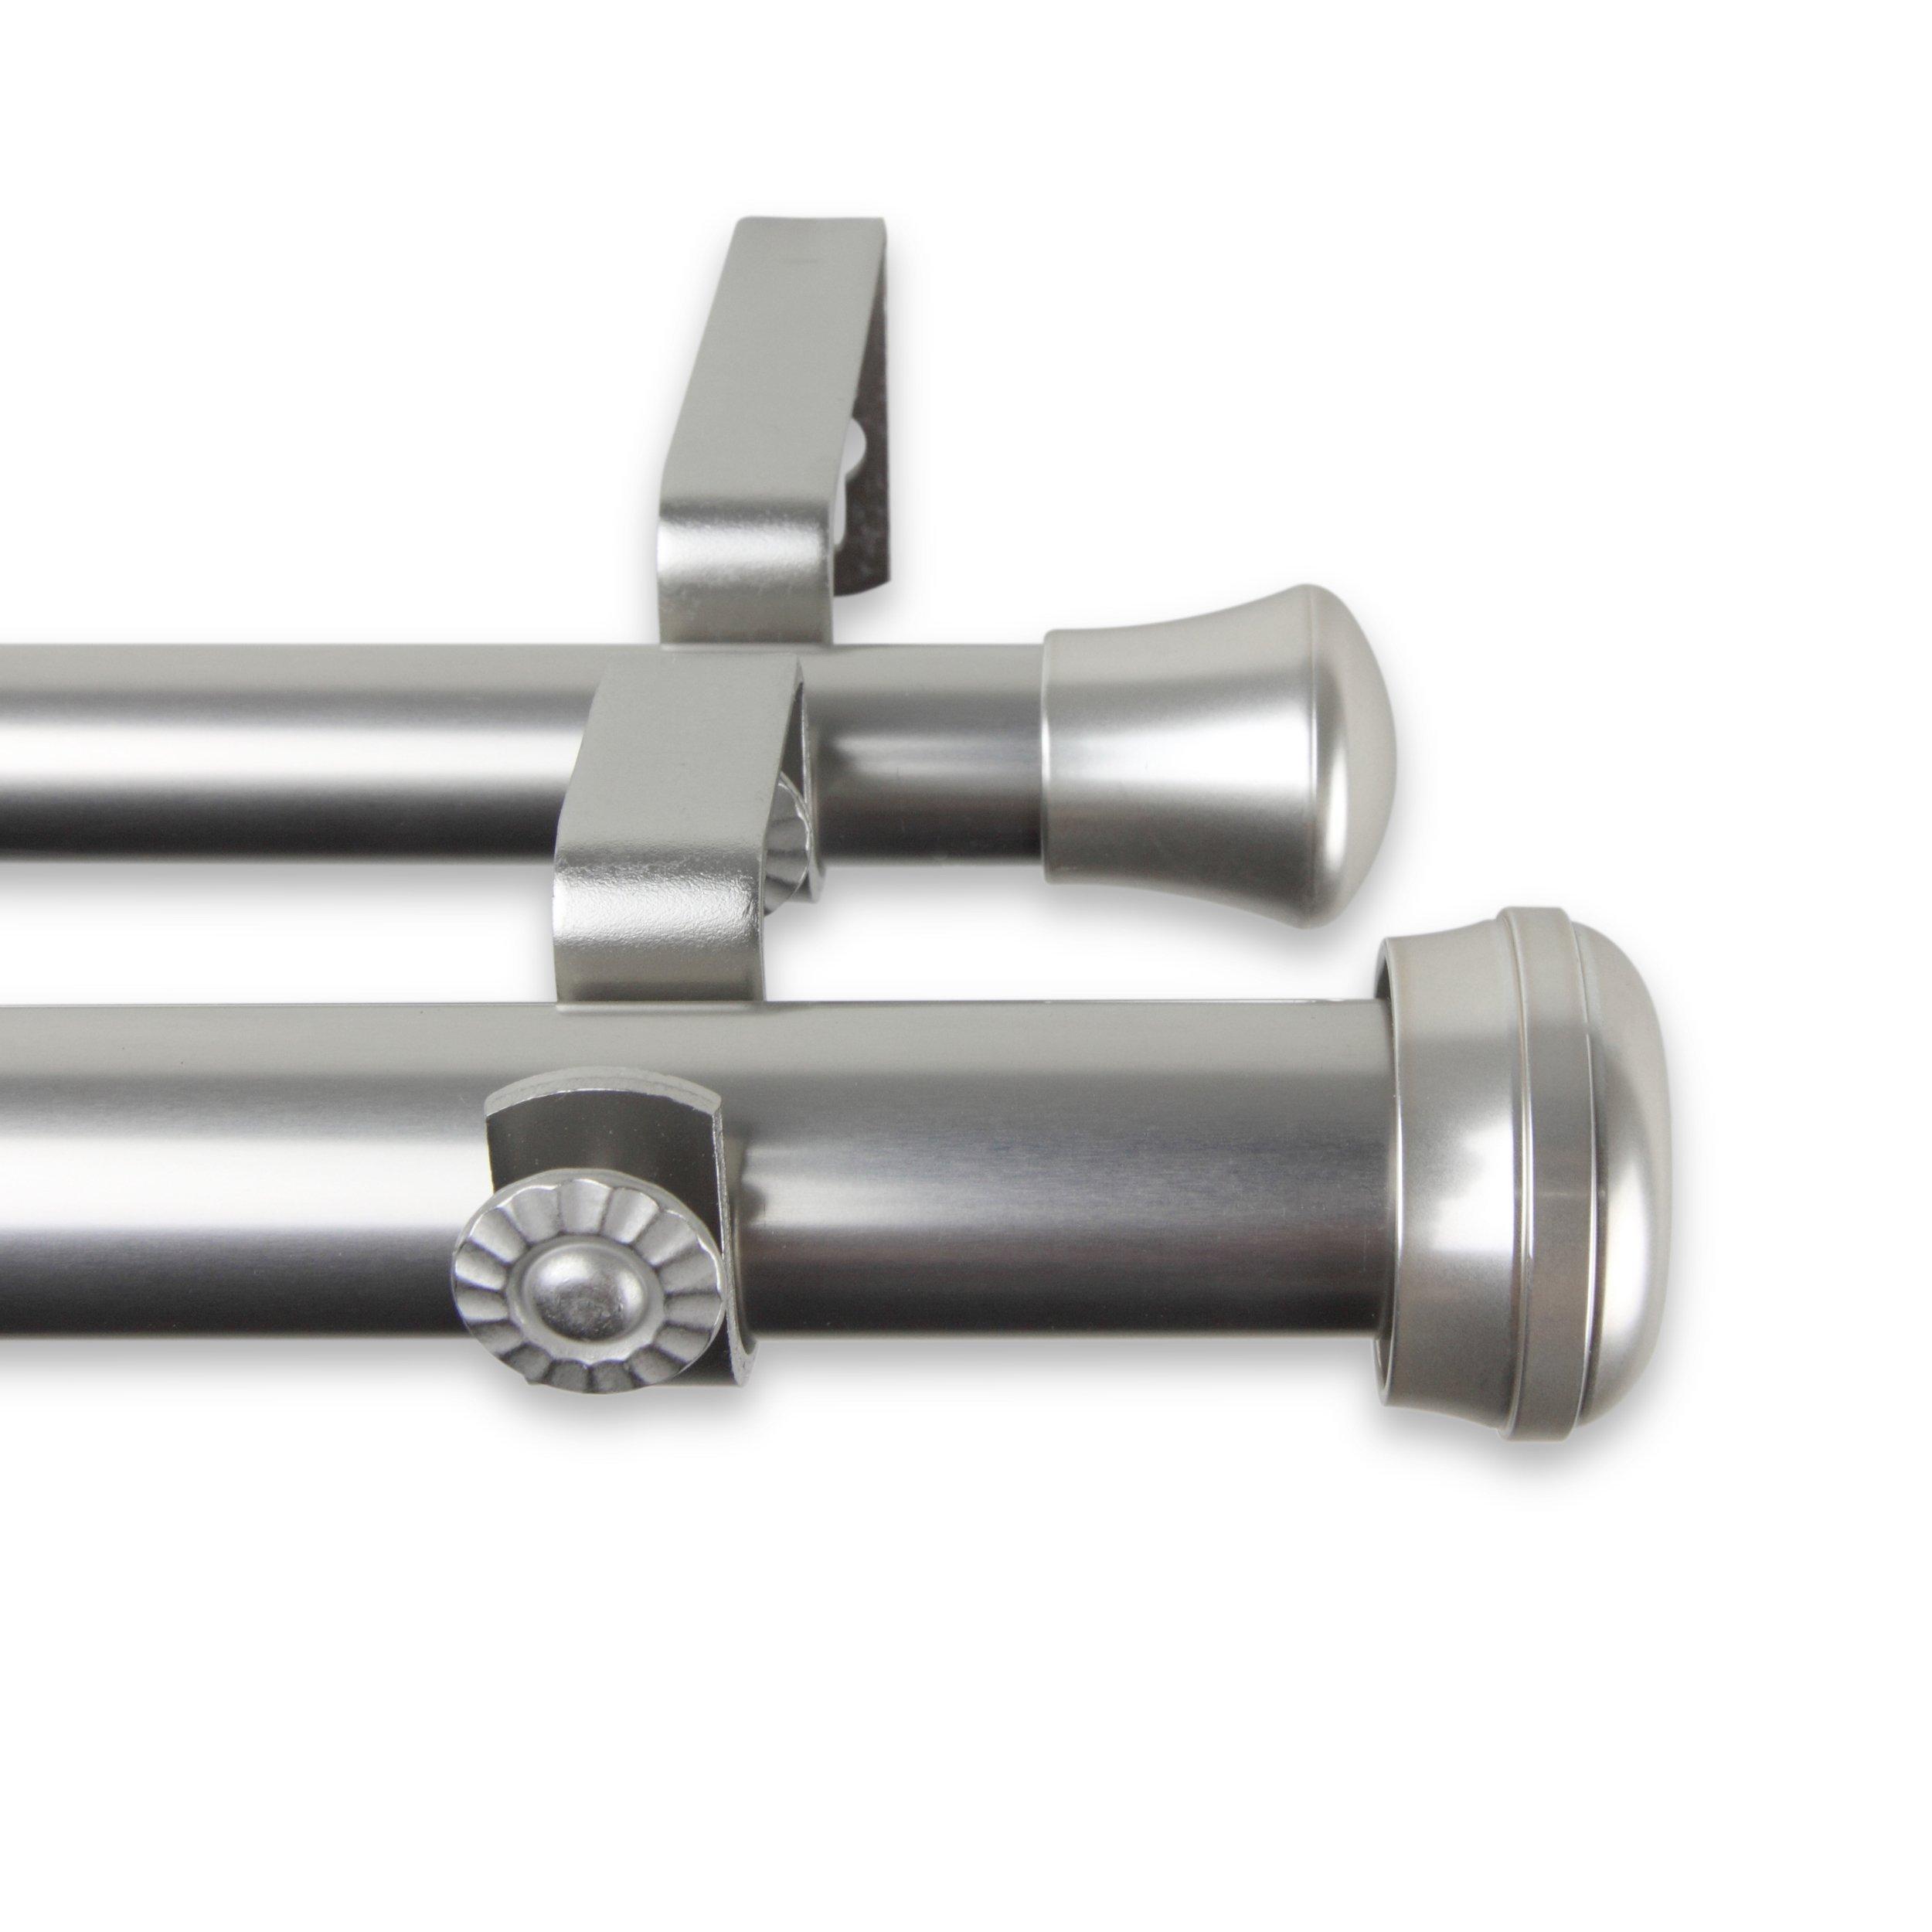 A&F Rod Decor - Alloy Double Curtain Rod 1 inch diameter, 160 - 240 inch - Satin Nickel by A&F Rod Decor